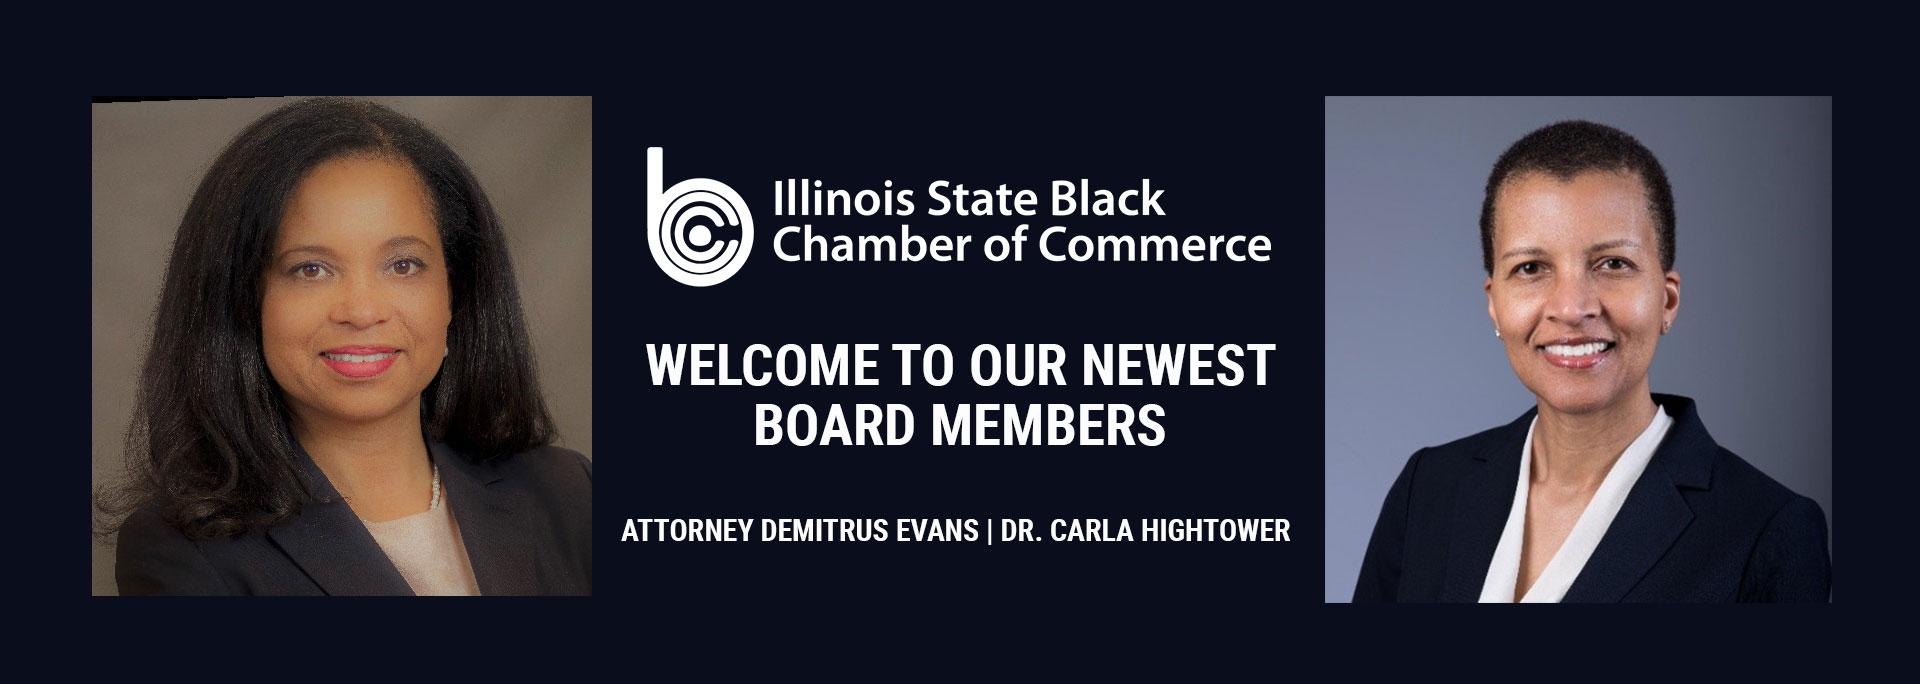 ILBCC board members